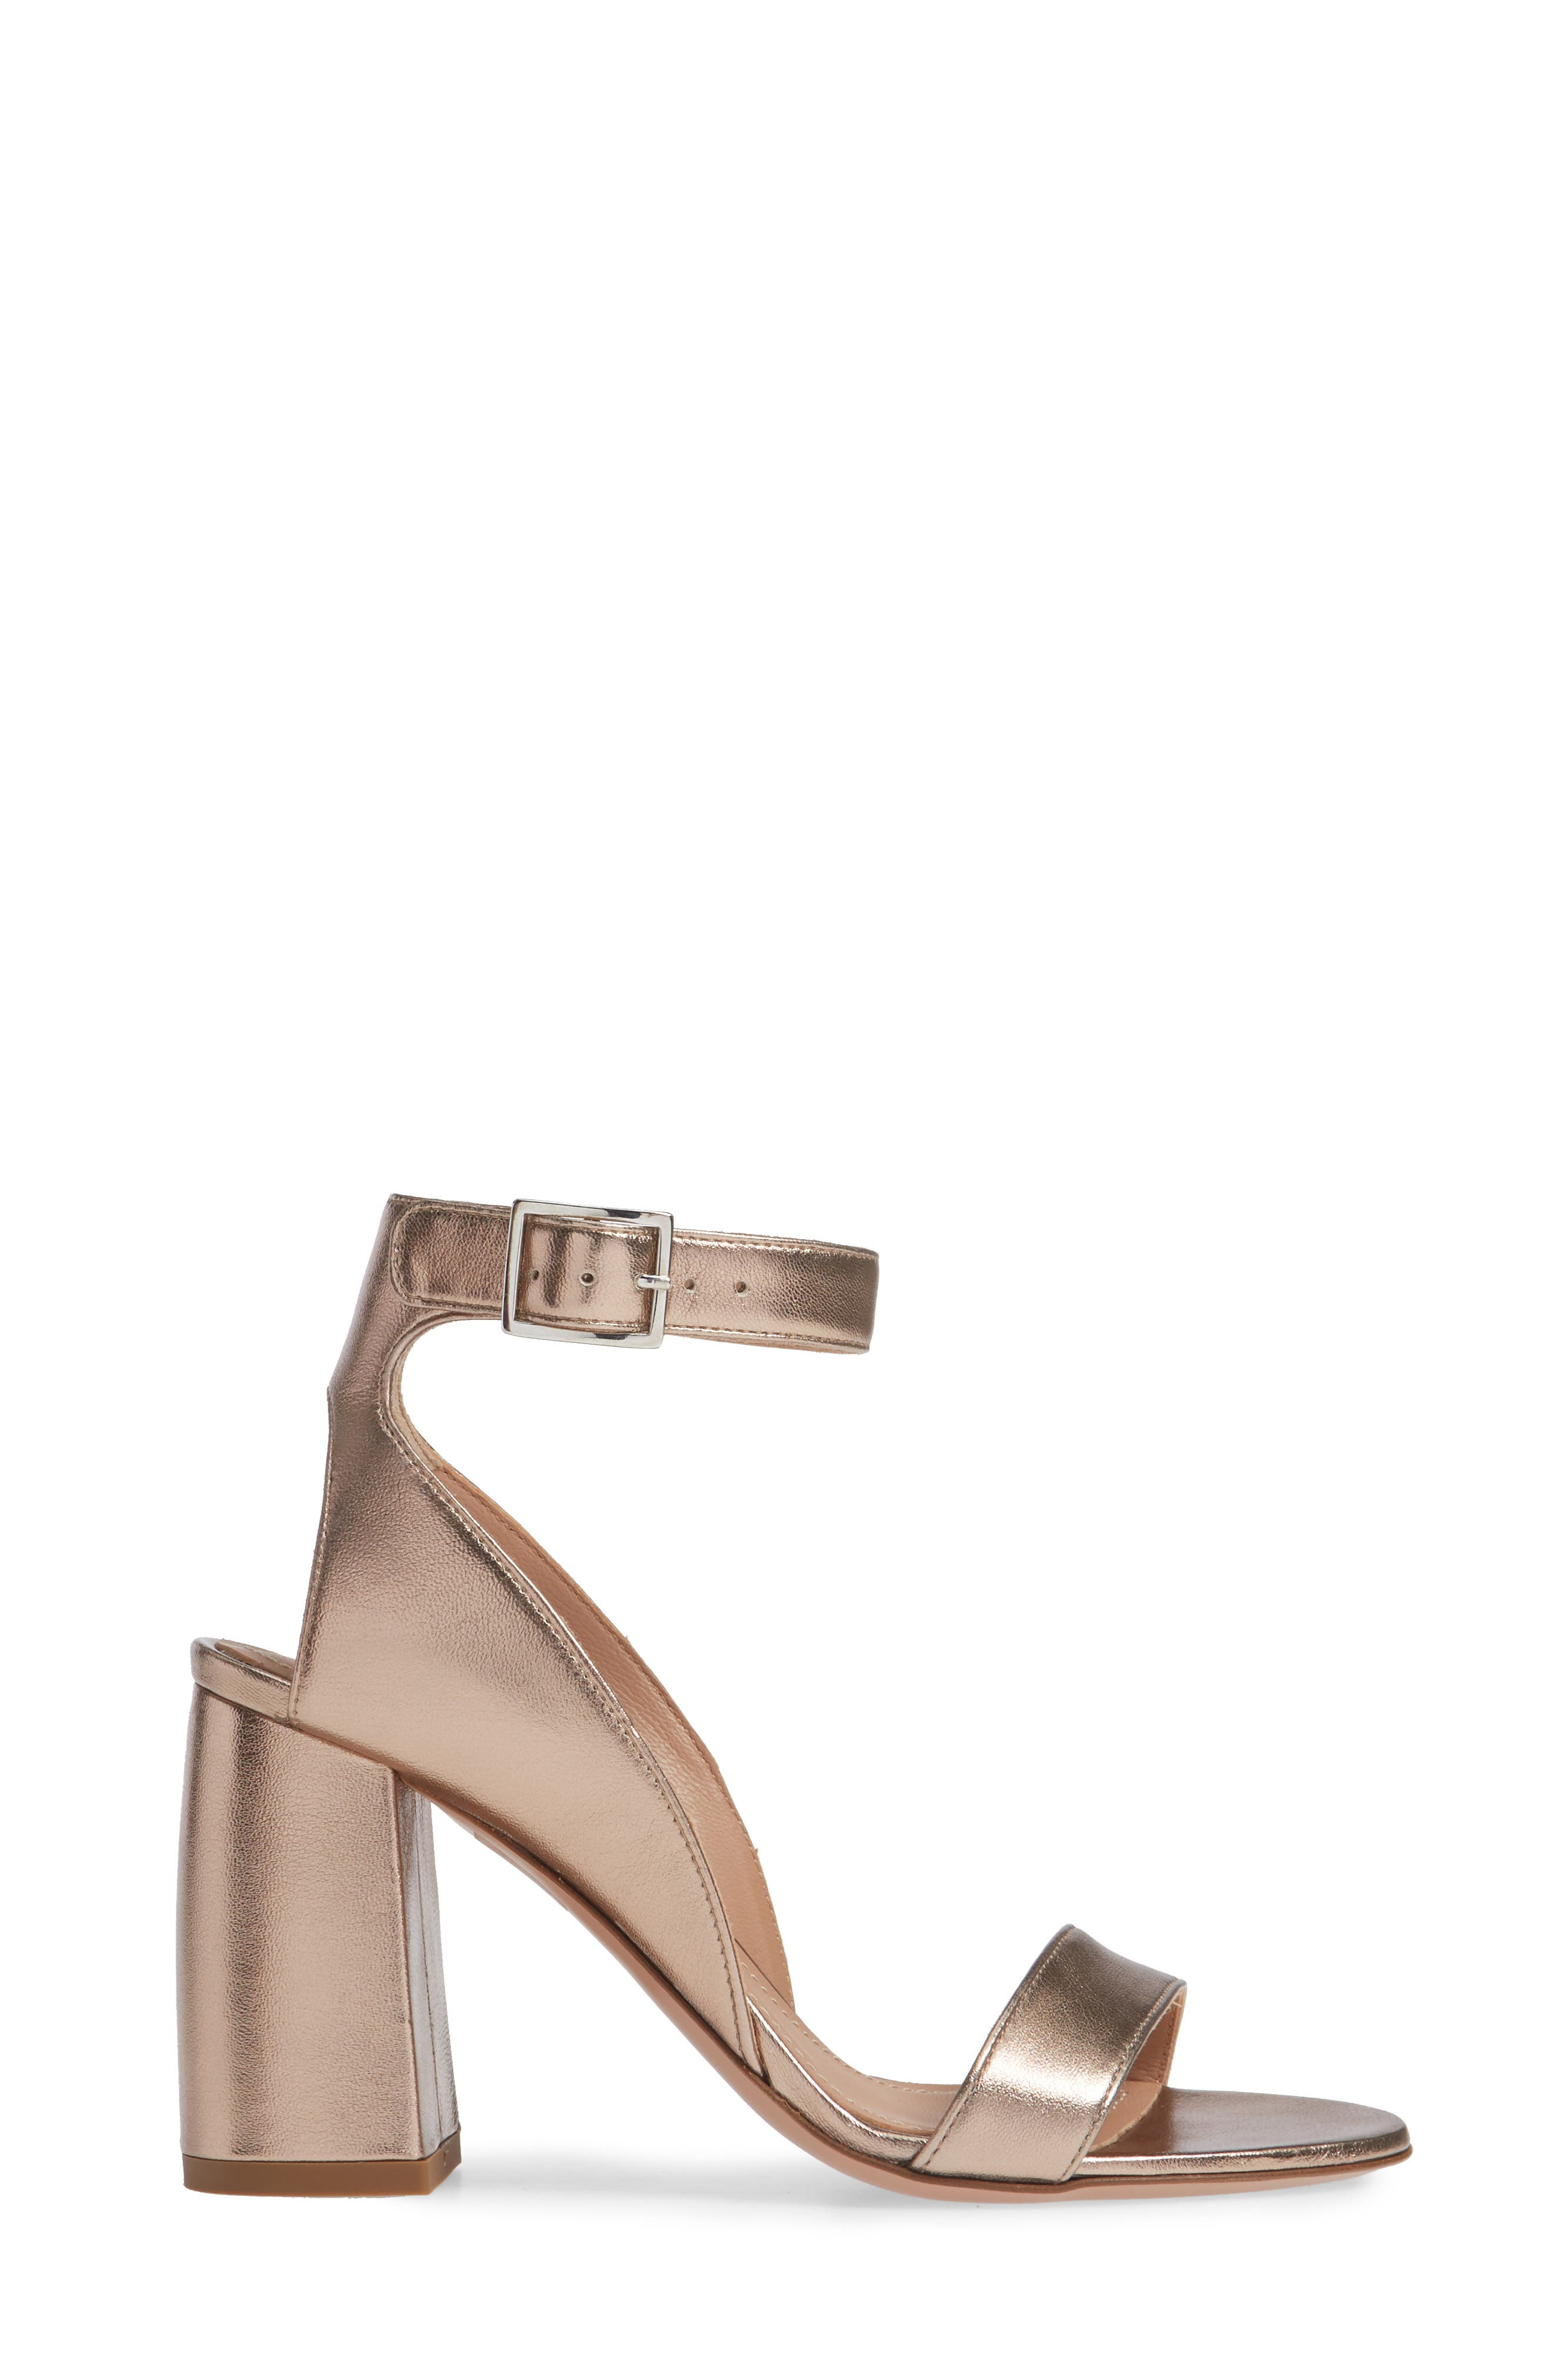 Guilia Block Heel Sandal,                             Alternate thumbnail 3, color,                             BRONZE LEATHER